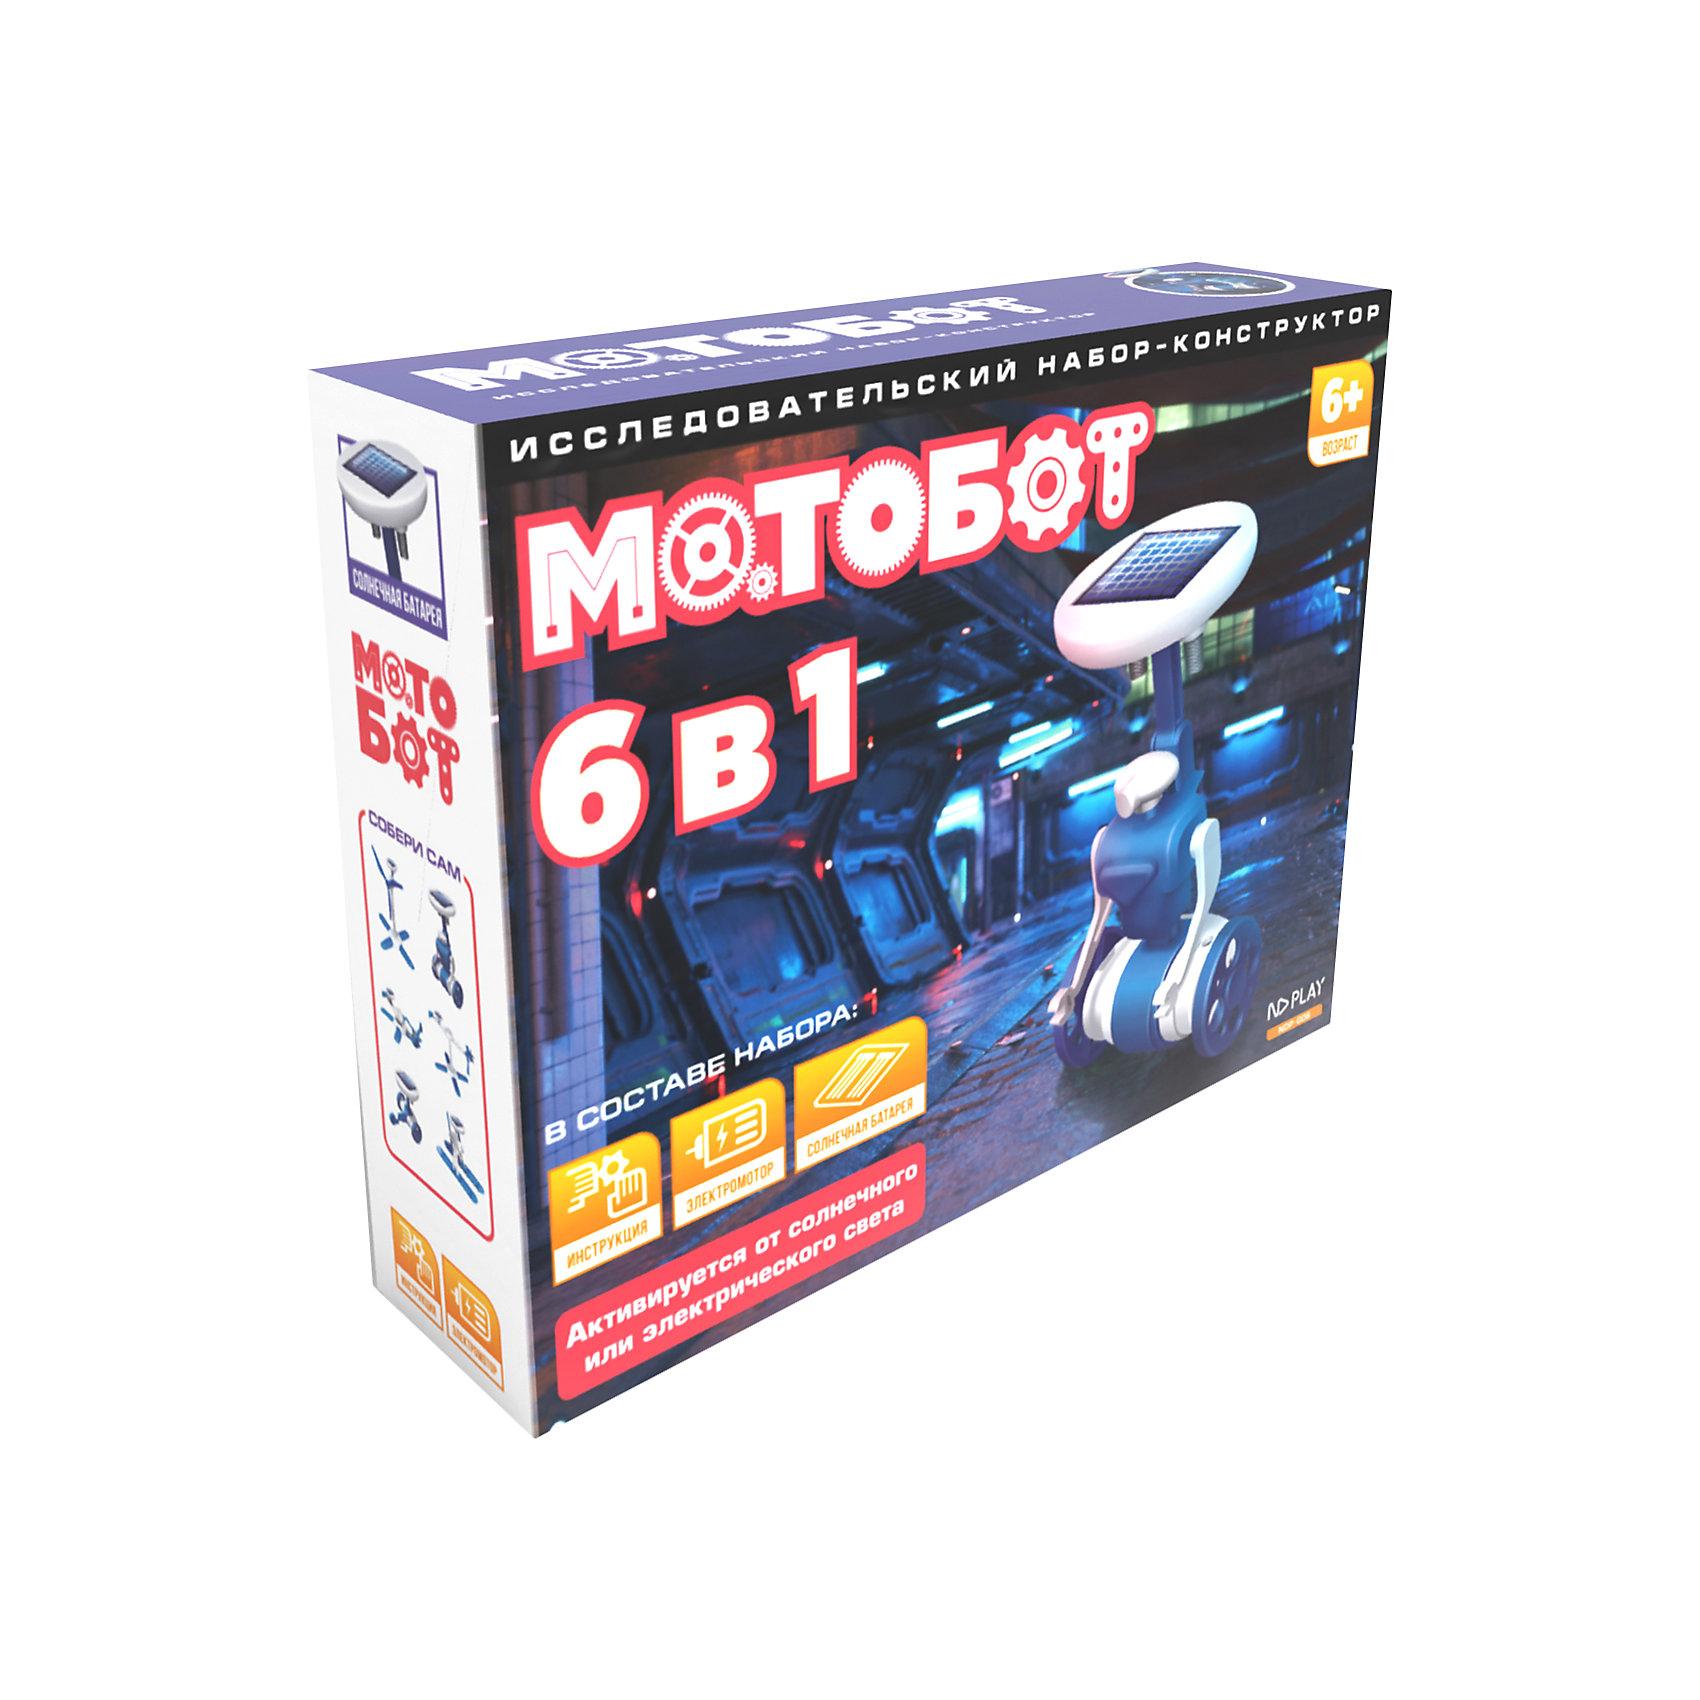 Мотобот, 6 в 1